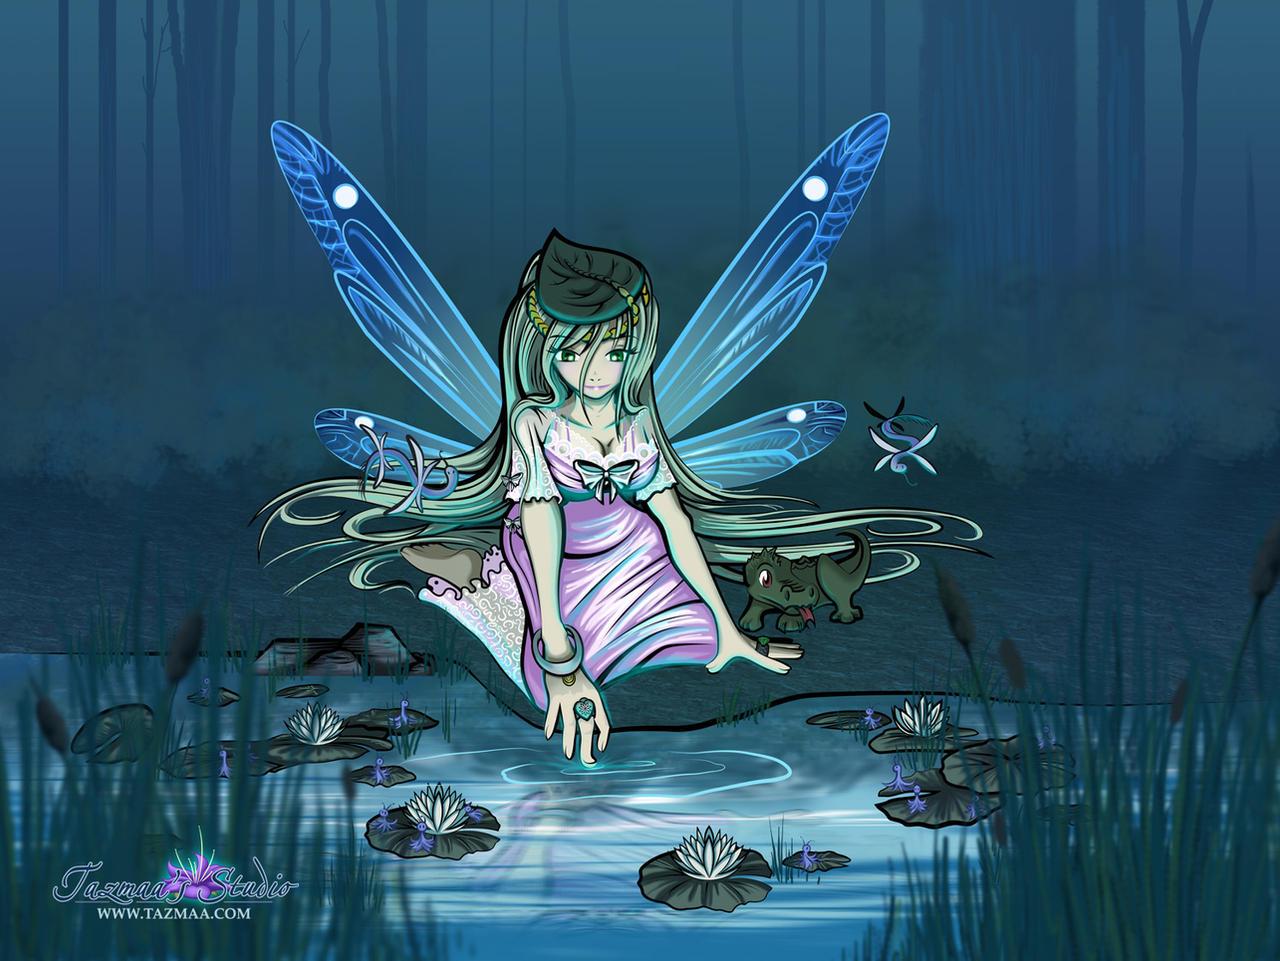 Water Fae Spirit Fantasy / Anime Style Fairy